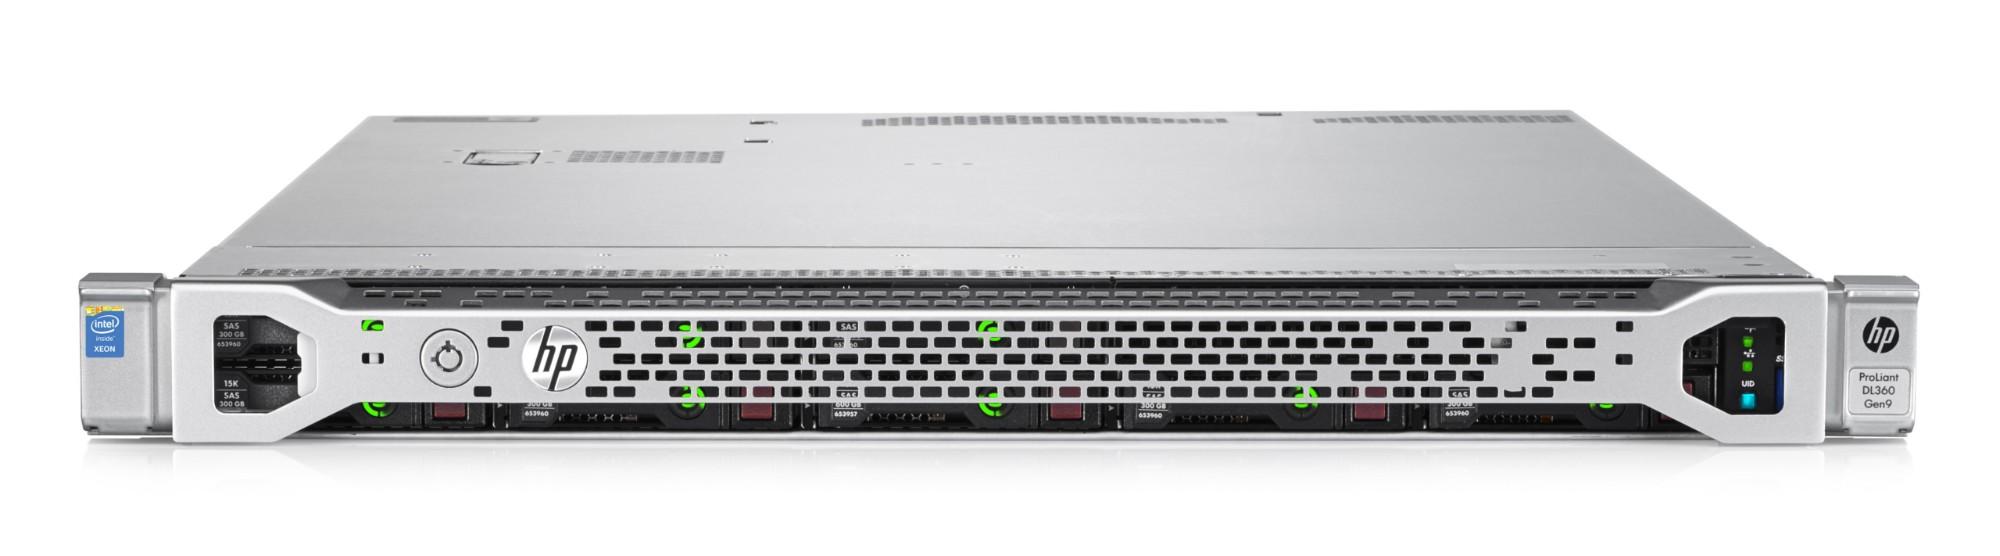 Hewlett Packard Enterprise ProLiant DL360 Gen9 2.4GHz E5-2640V4 500W Rack (1U) server